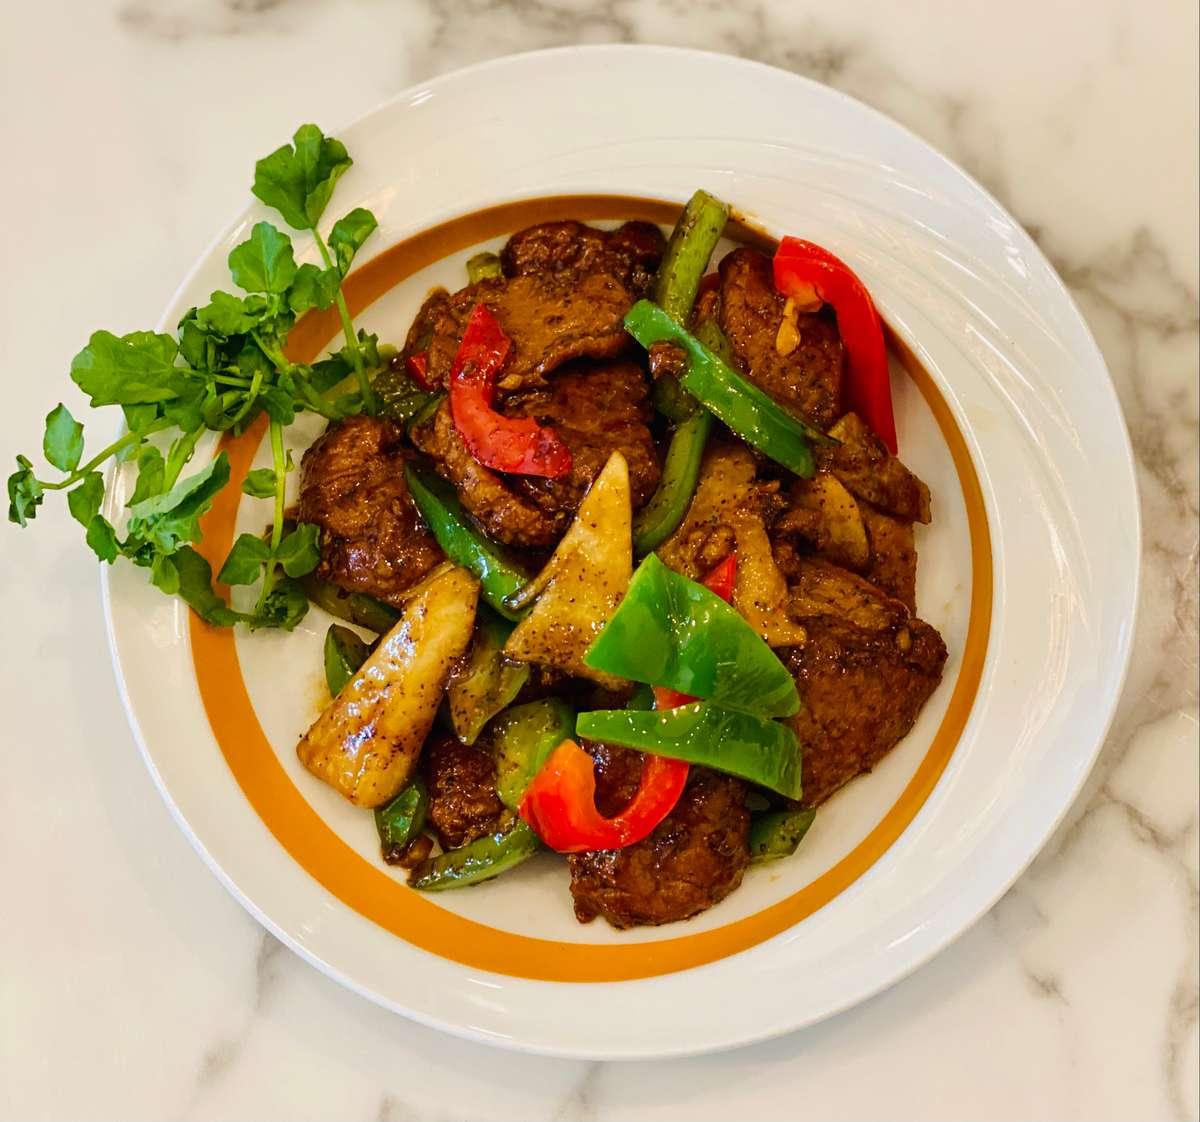 Black Pepper Beef or Chicken 黑椒素牛肉/雞肉